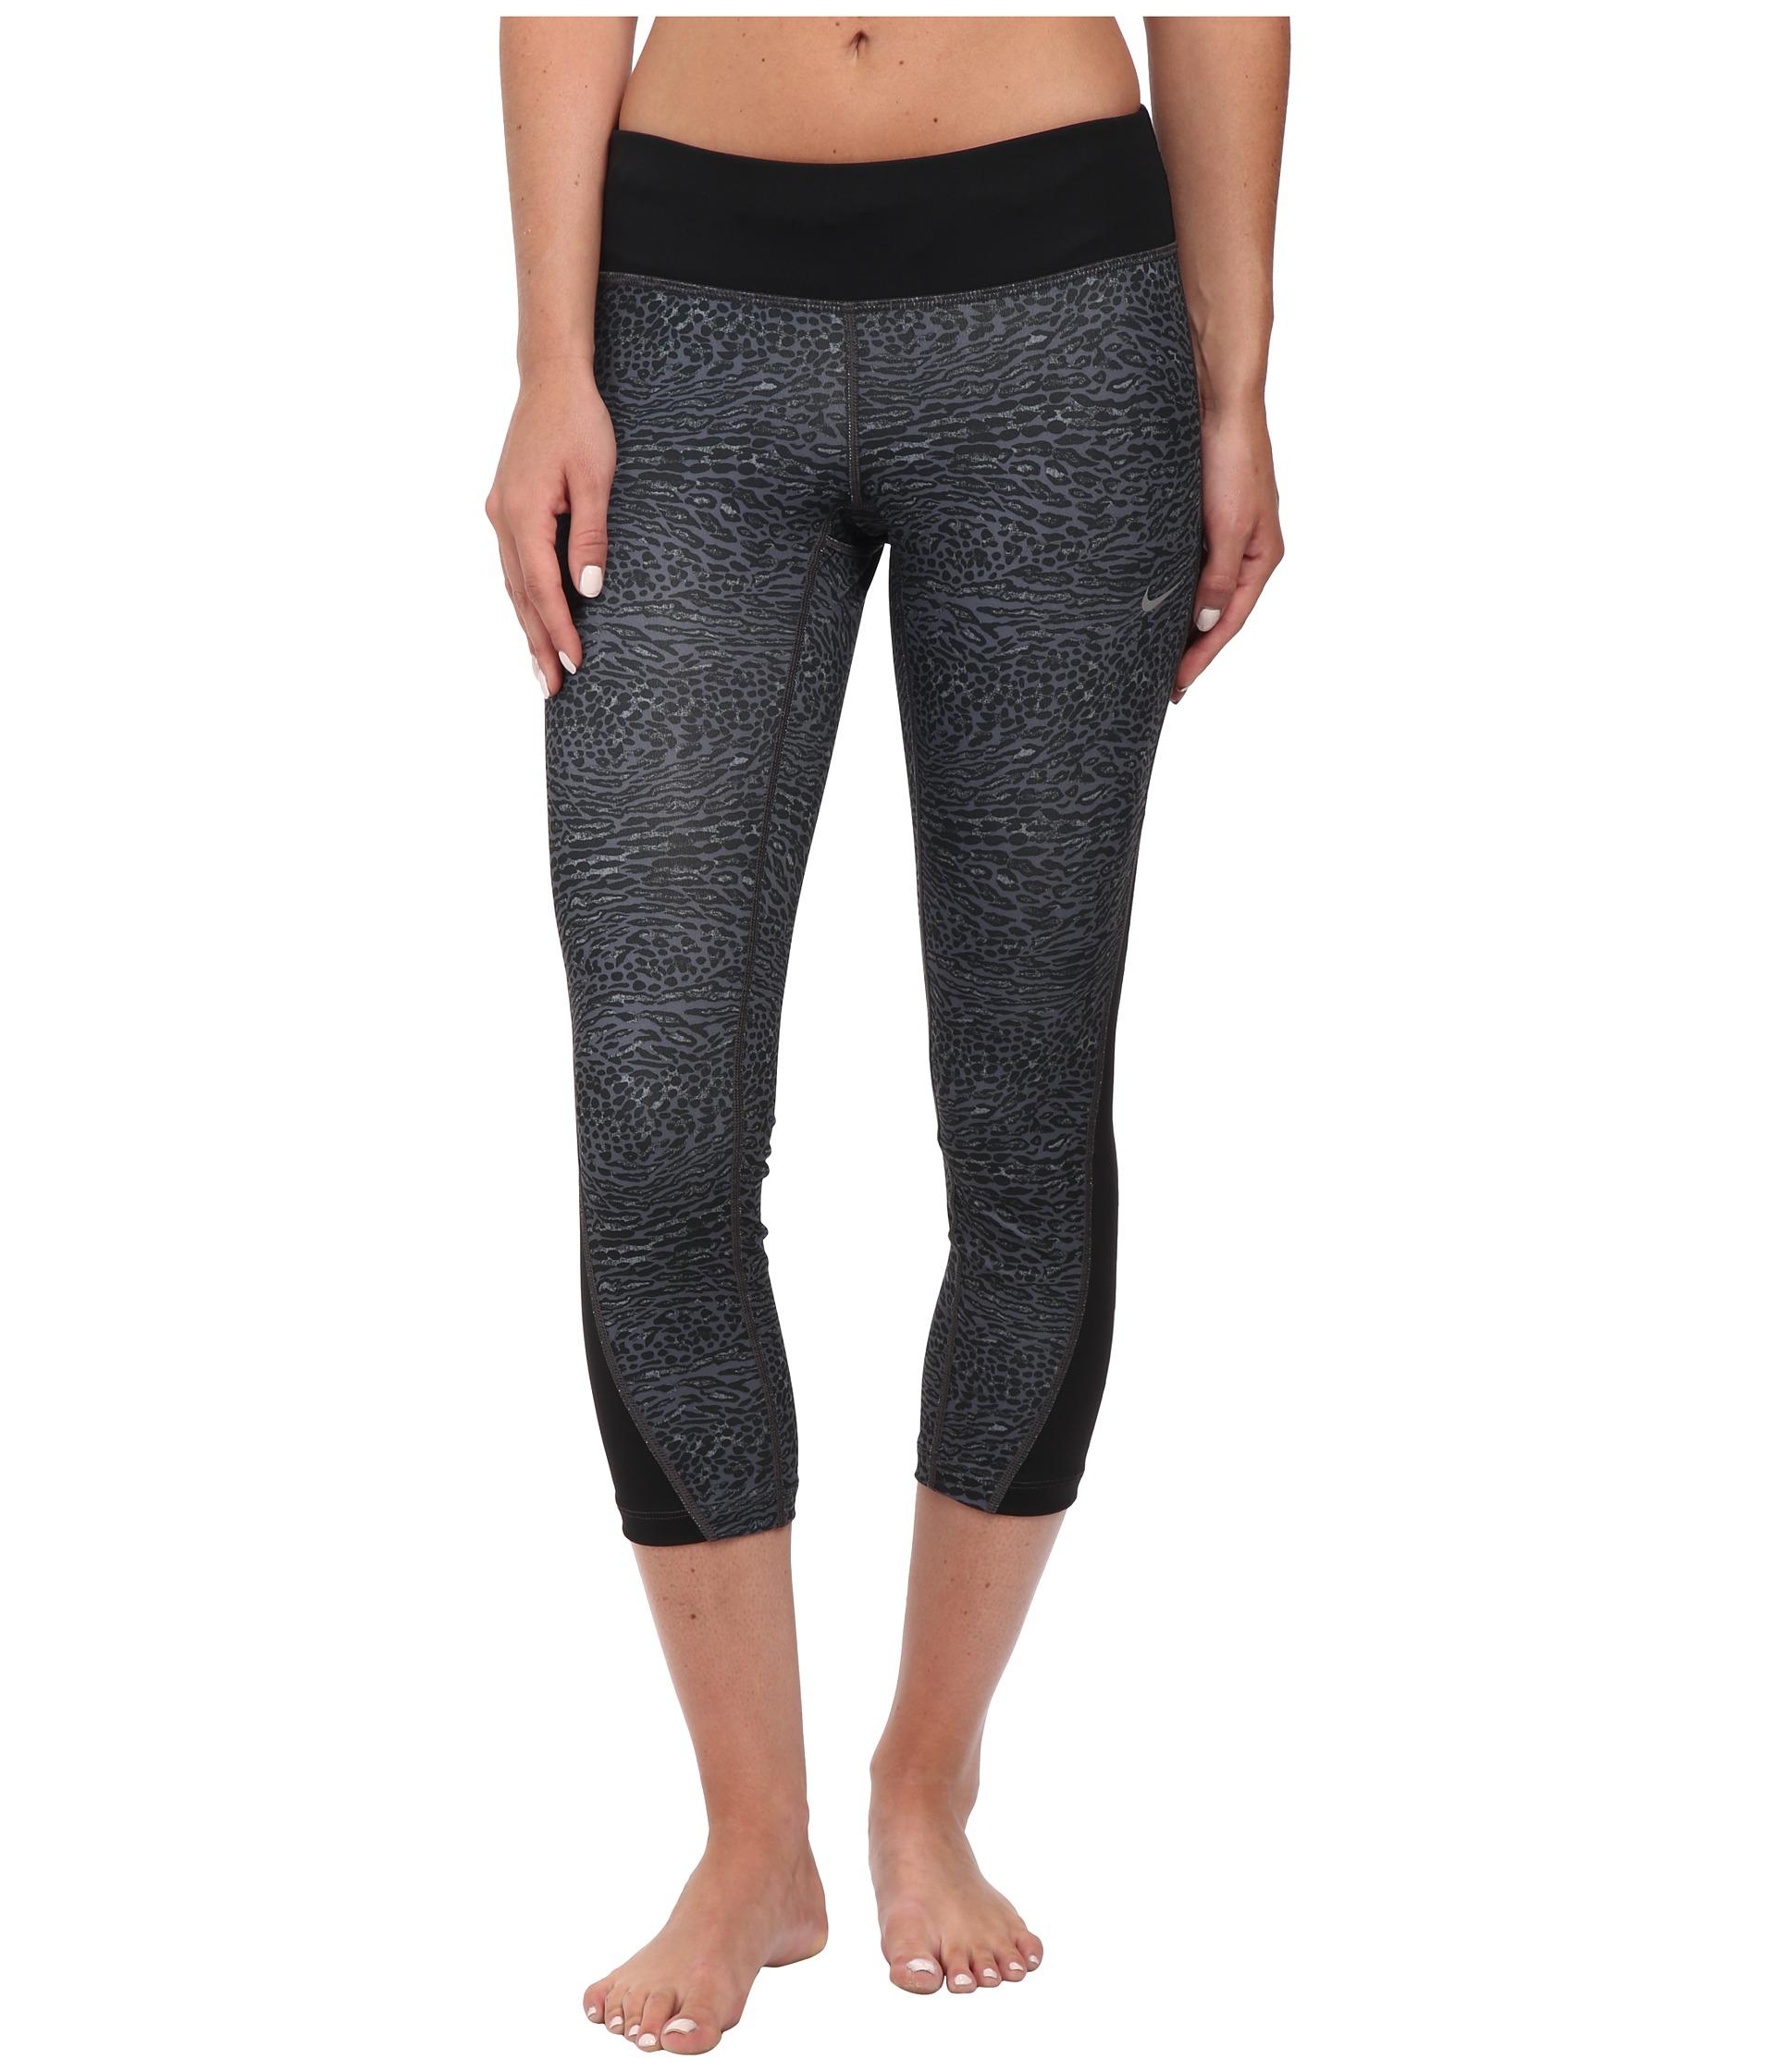 Nike Womens Dri-FIT? Racer Leopard Print Crop Black/Black/Reflective Silver - Pants